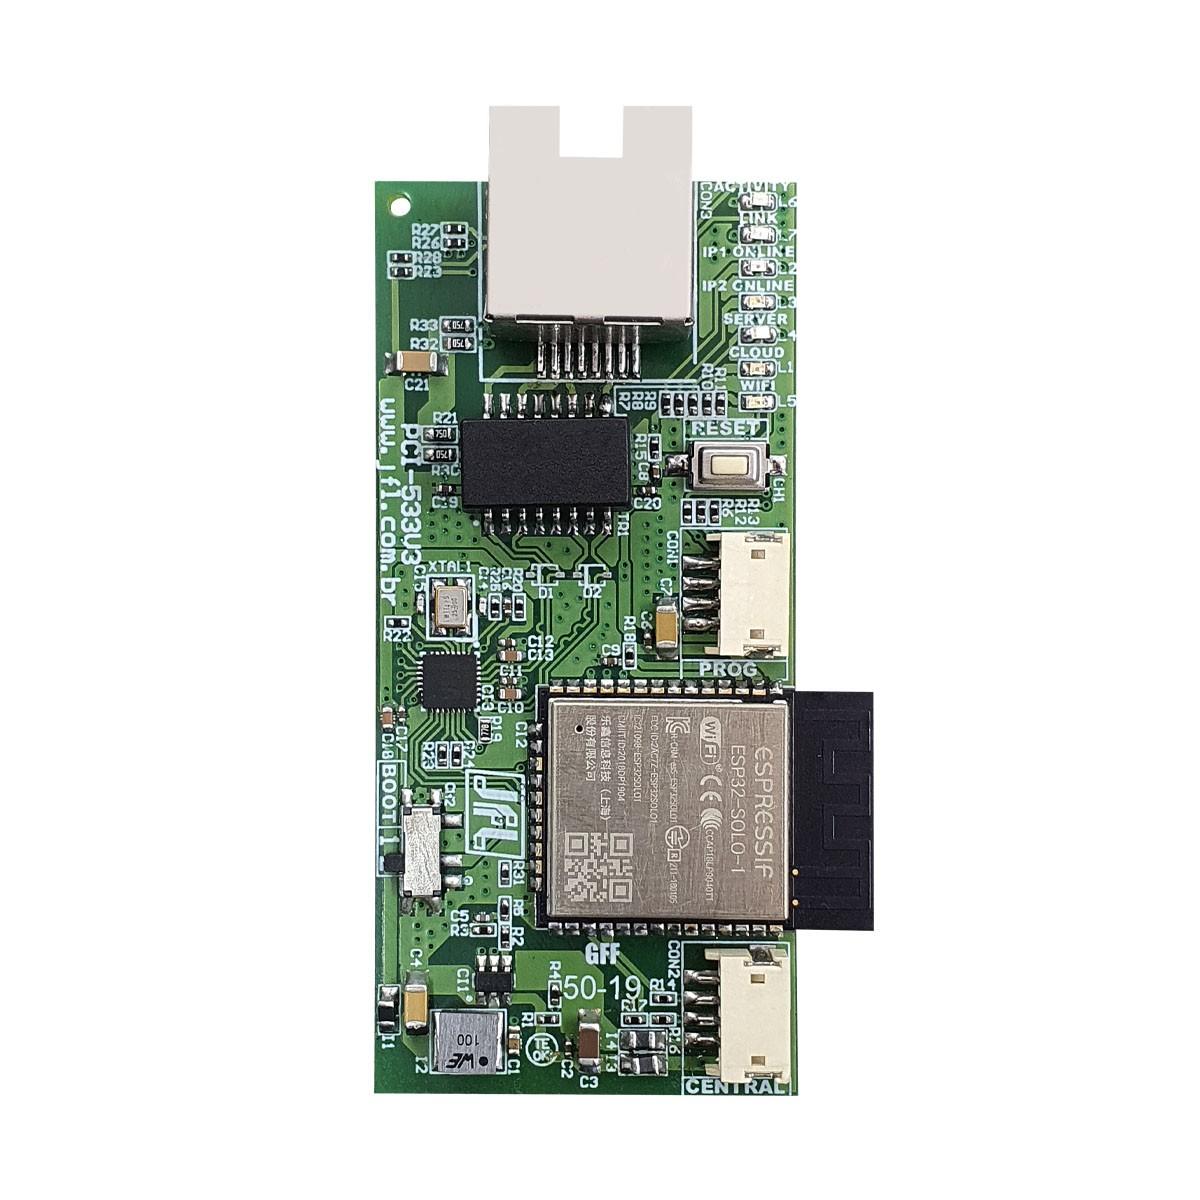 Kit Alarme SmartCloud 18 Jfl com 12 Sensores Shc Fit